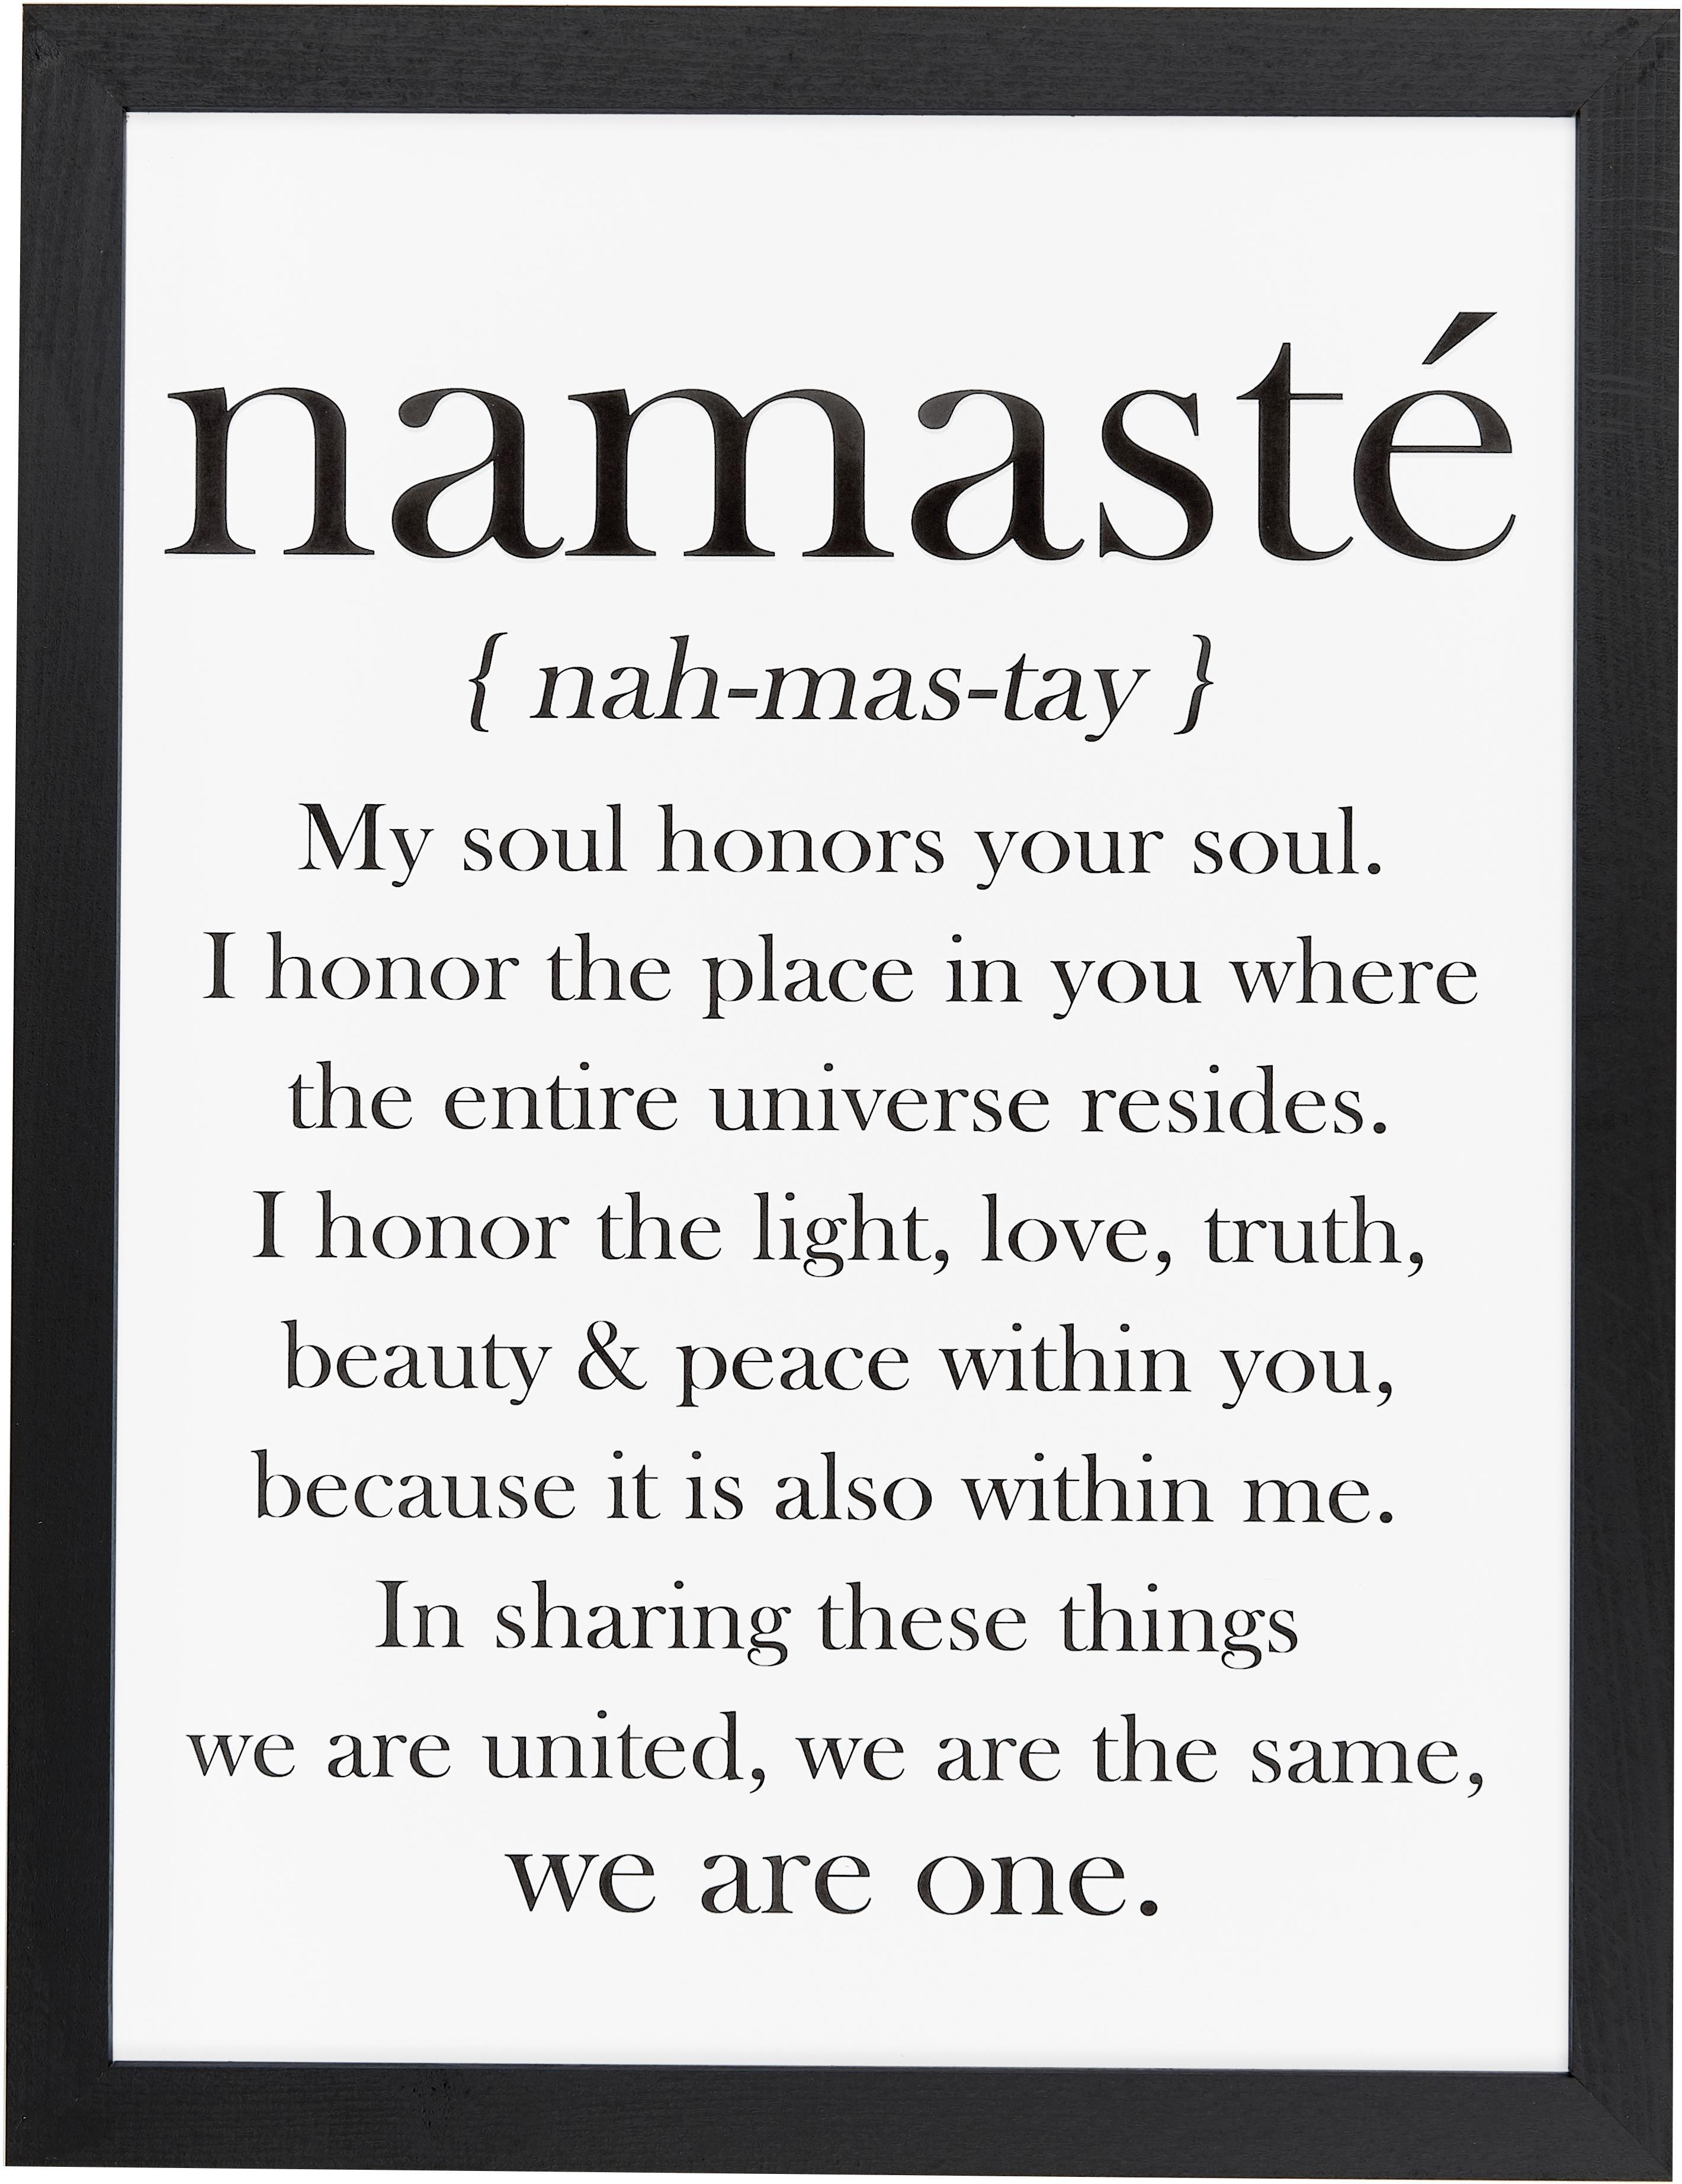 Stampa digitale incorniciata Namasté, Immagine: stampa digitale su carta,, Cornice: legno verniciato, Immagine: nero, bianco Cornice: nero, Larg. 33 x Alt. 43 cm